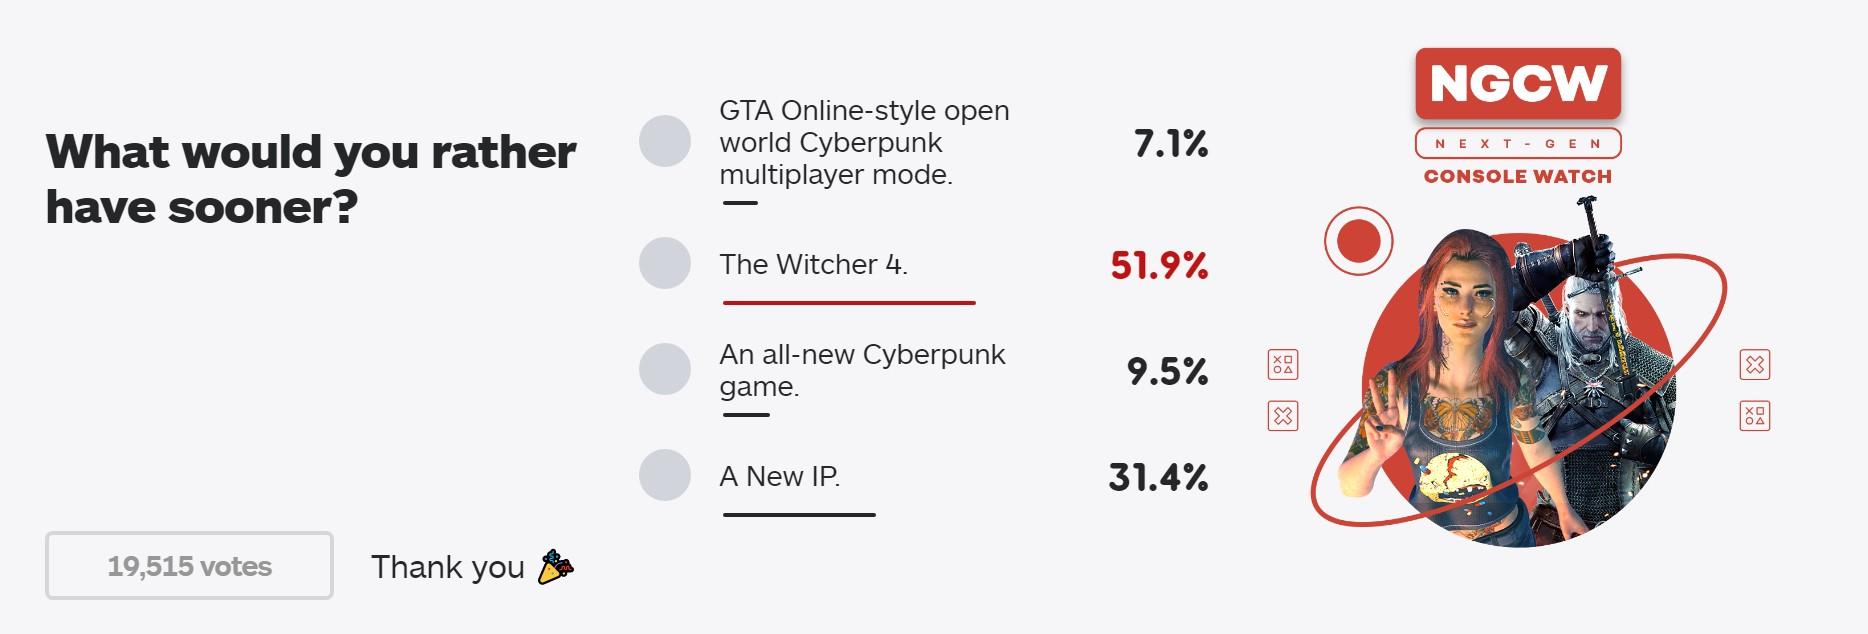 IGN新投票:你希望CDPR下一作是什么?巫师4成首选